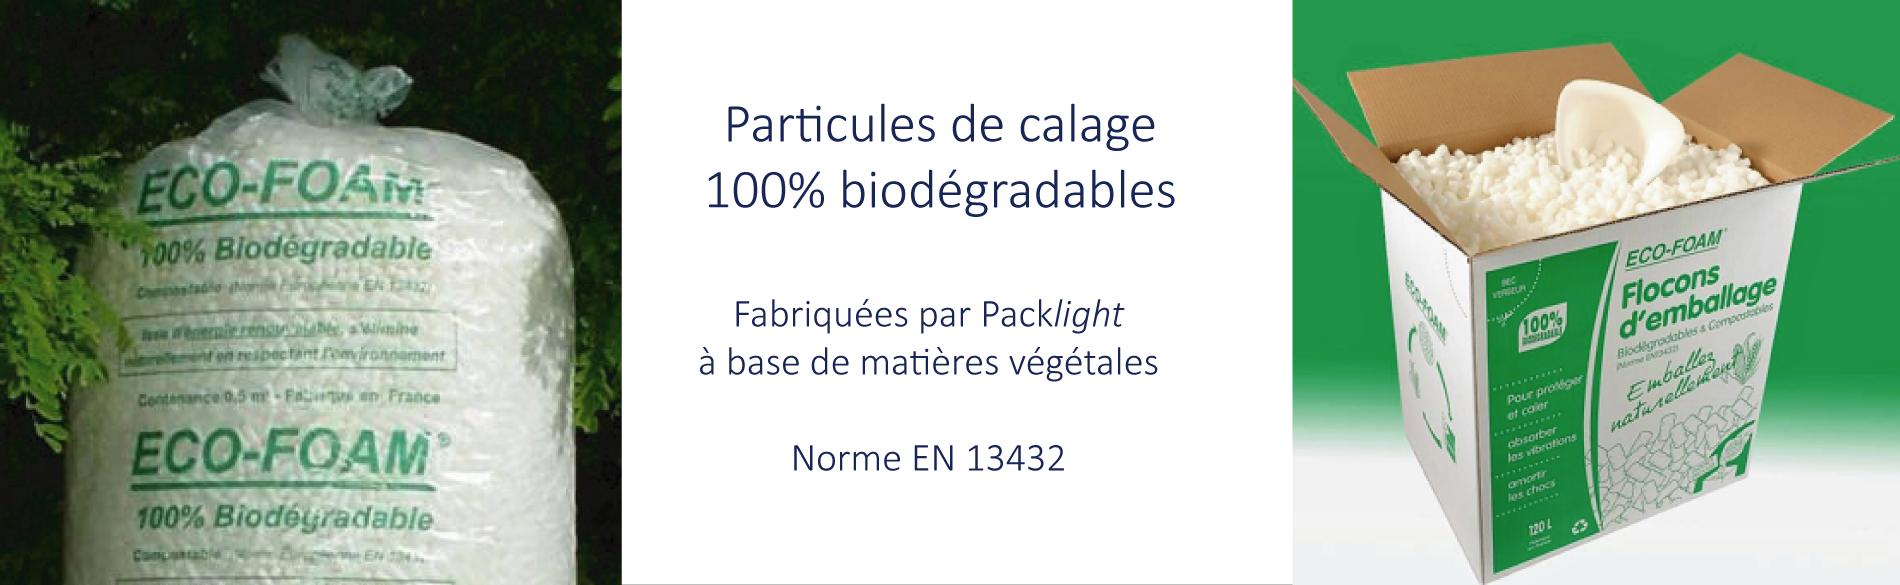 particules calage bio - Packlight